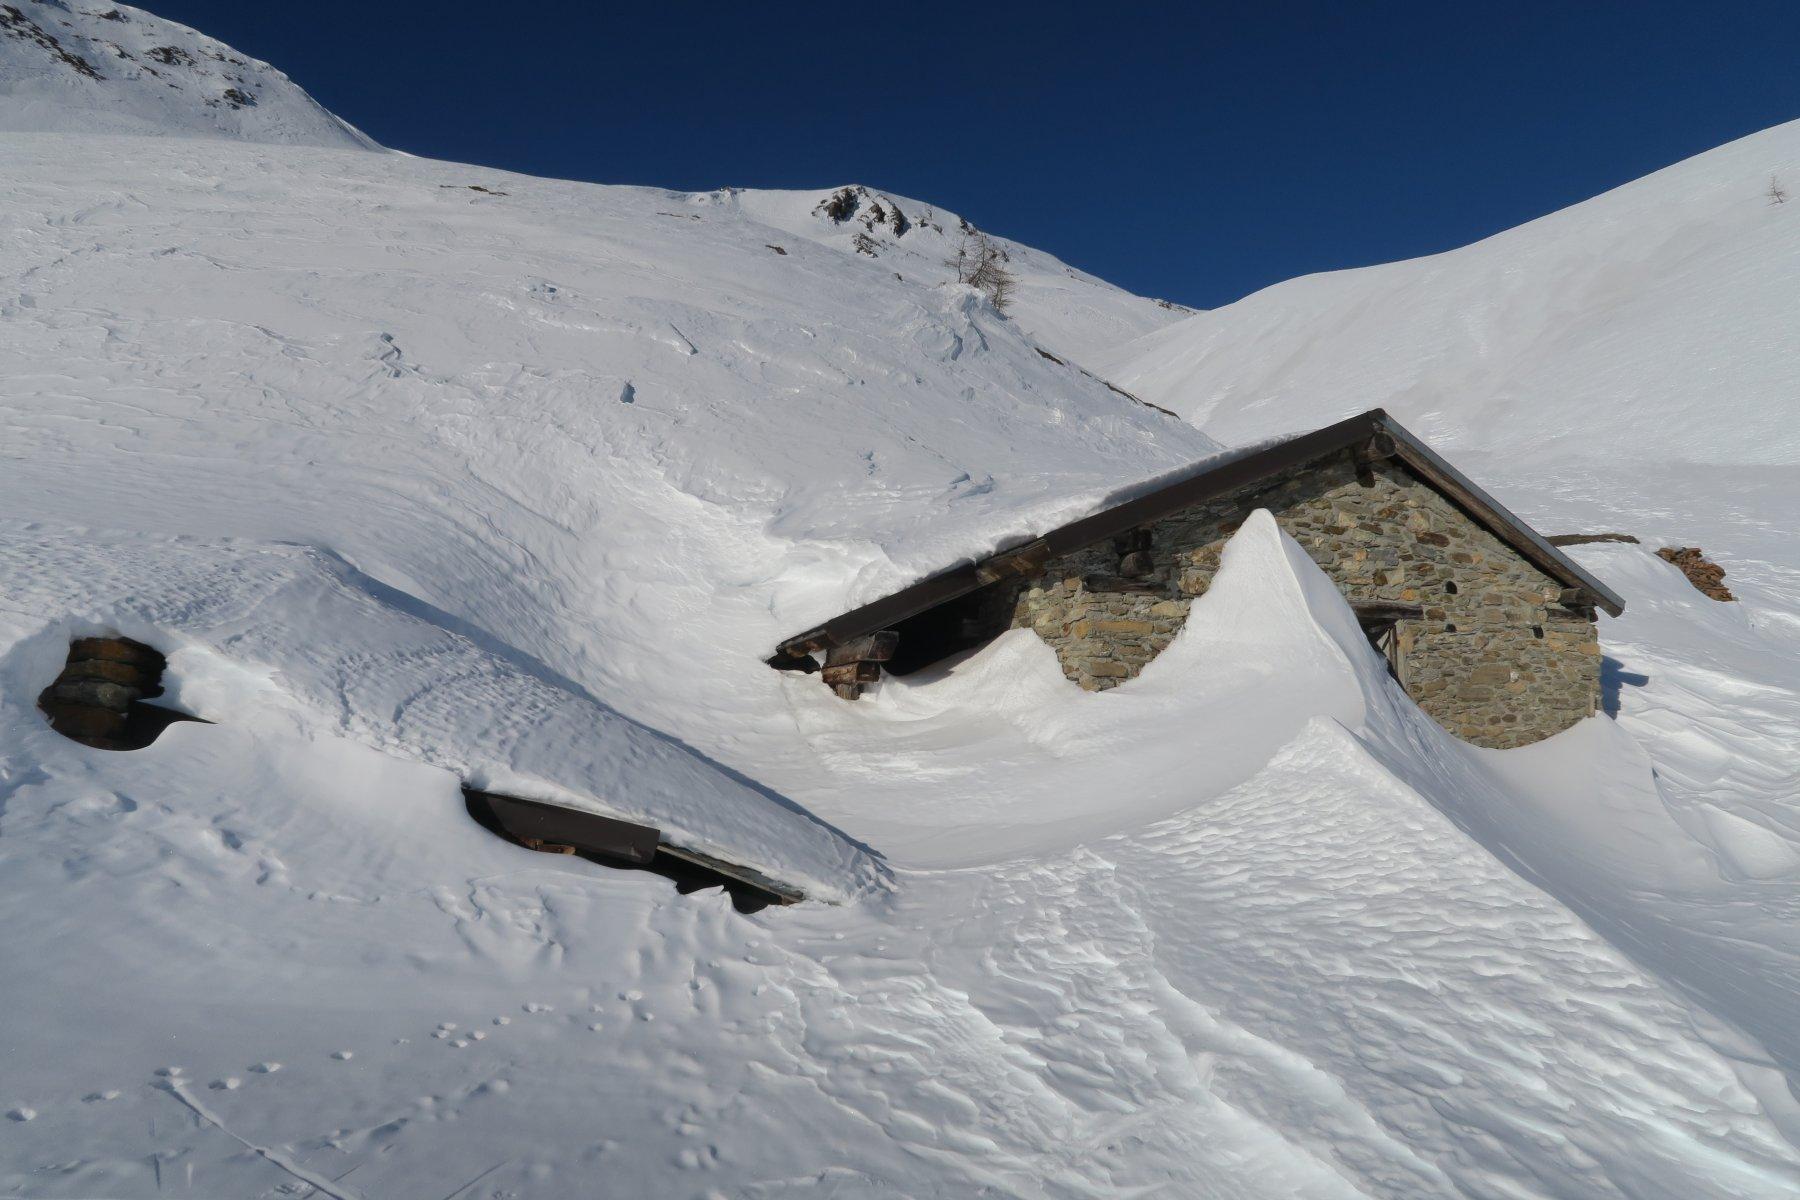 l'alpe di Metz semisommersa dalla neve